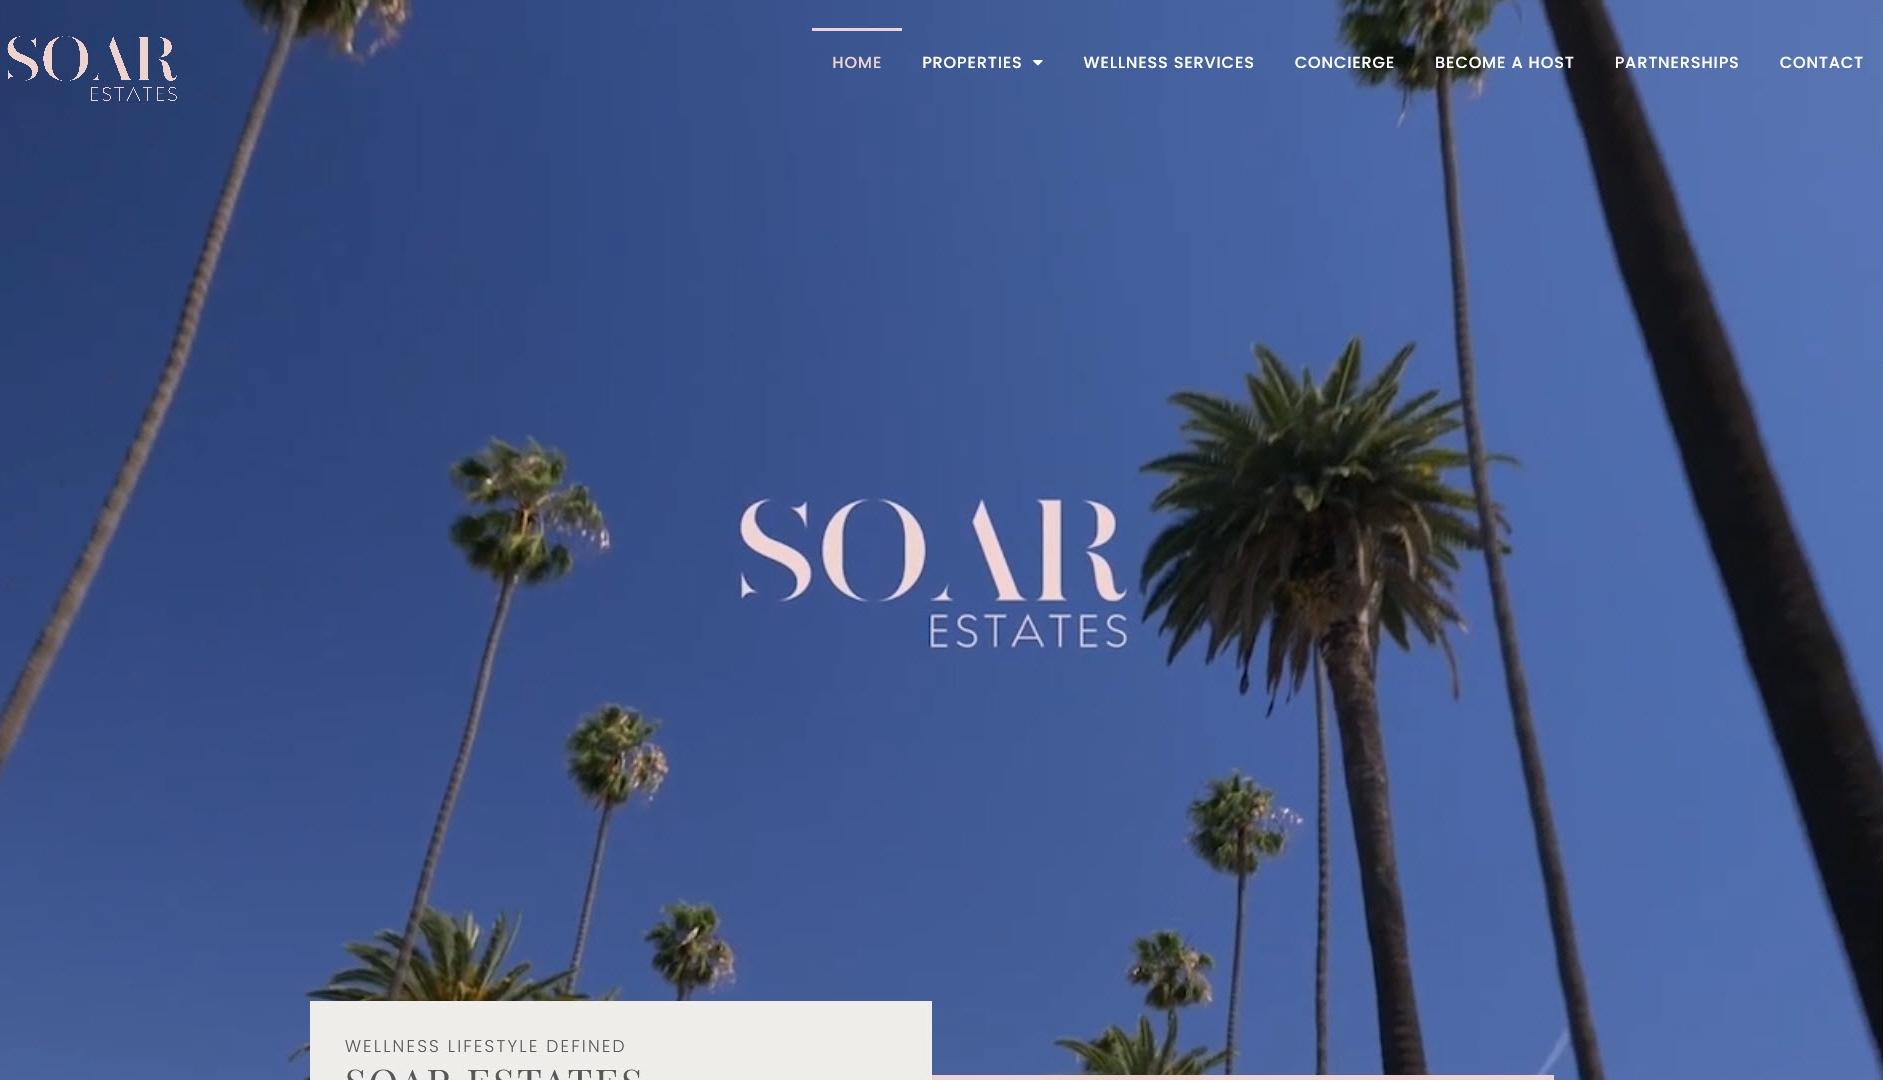 Soar Estates